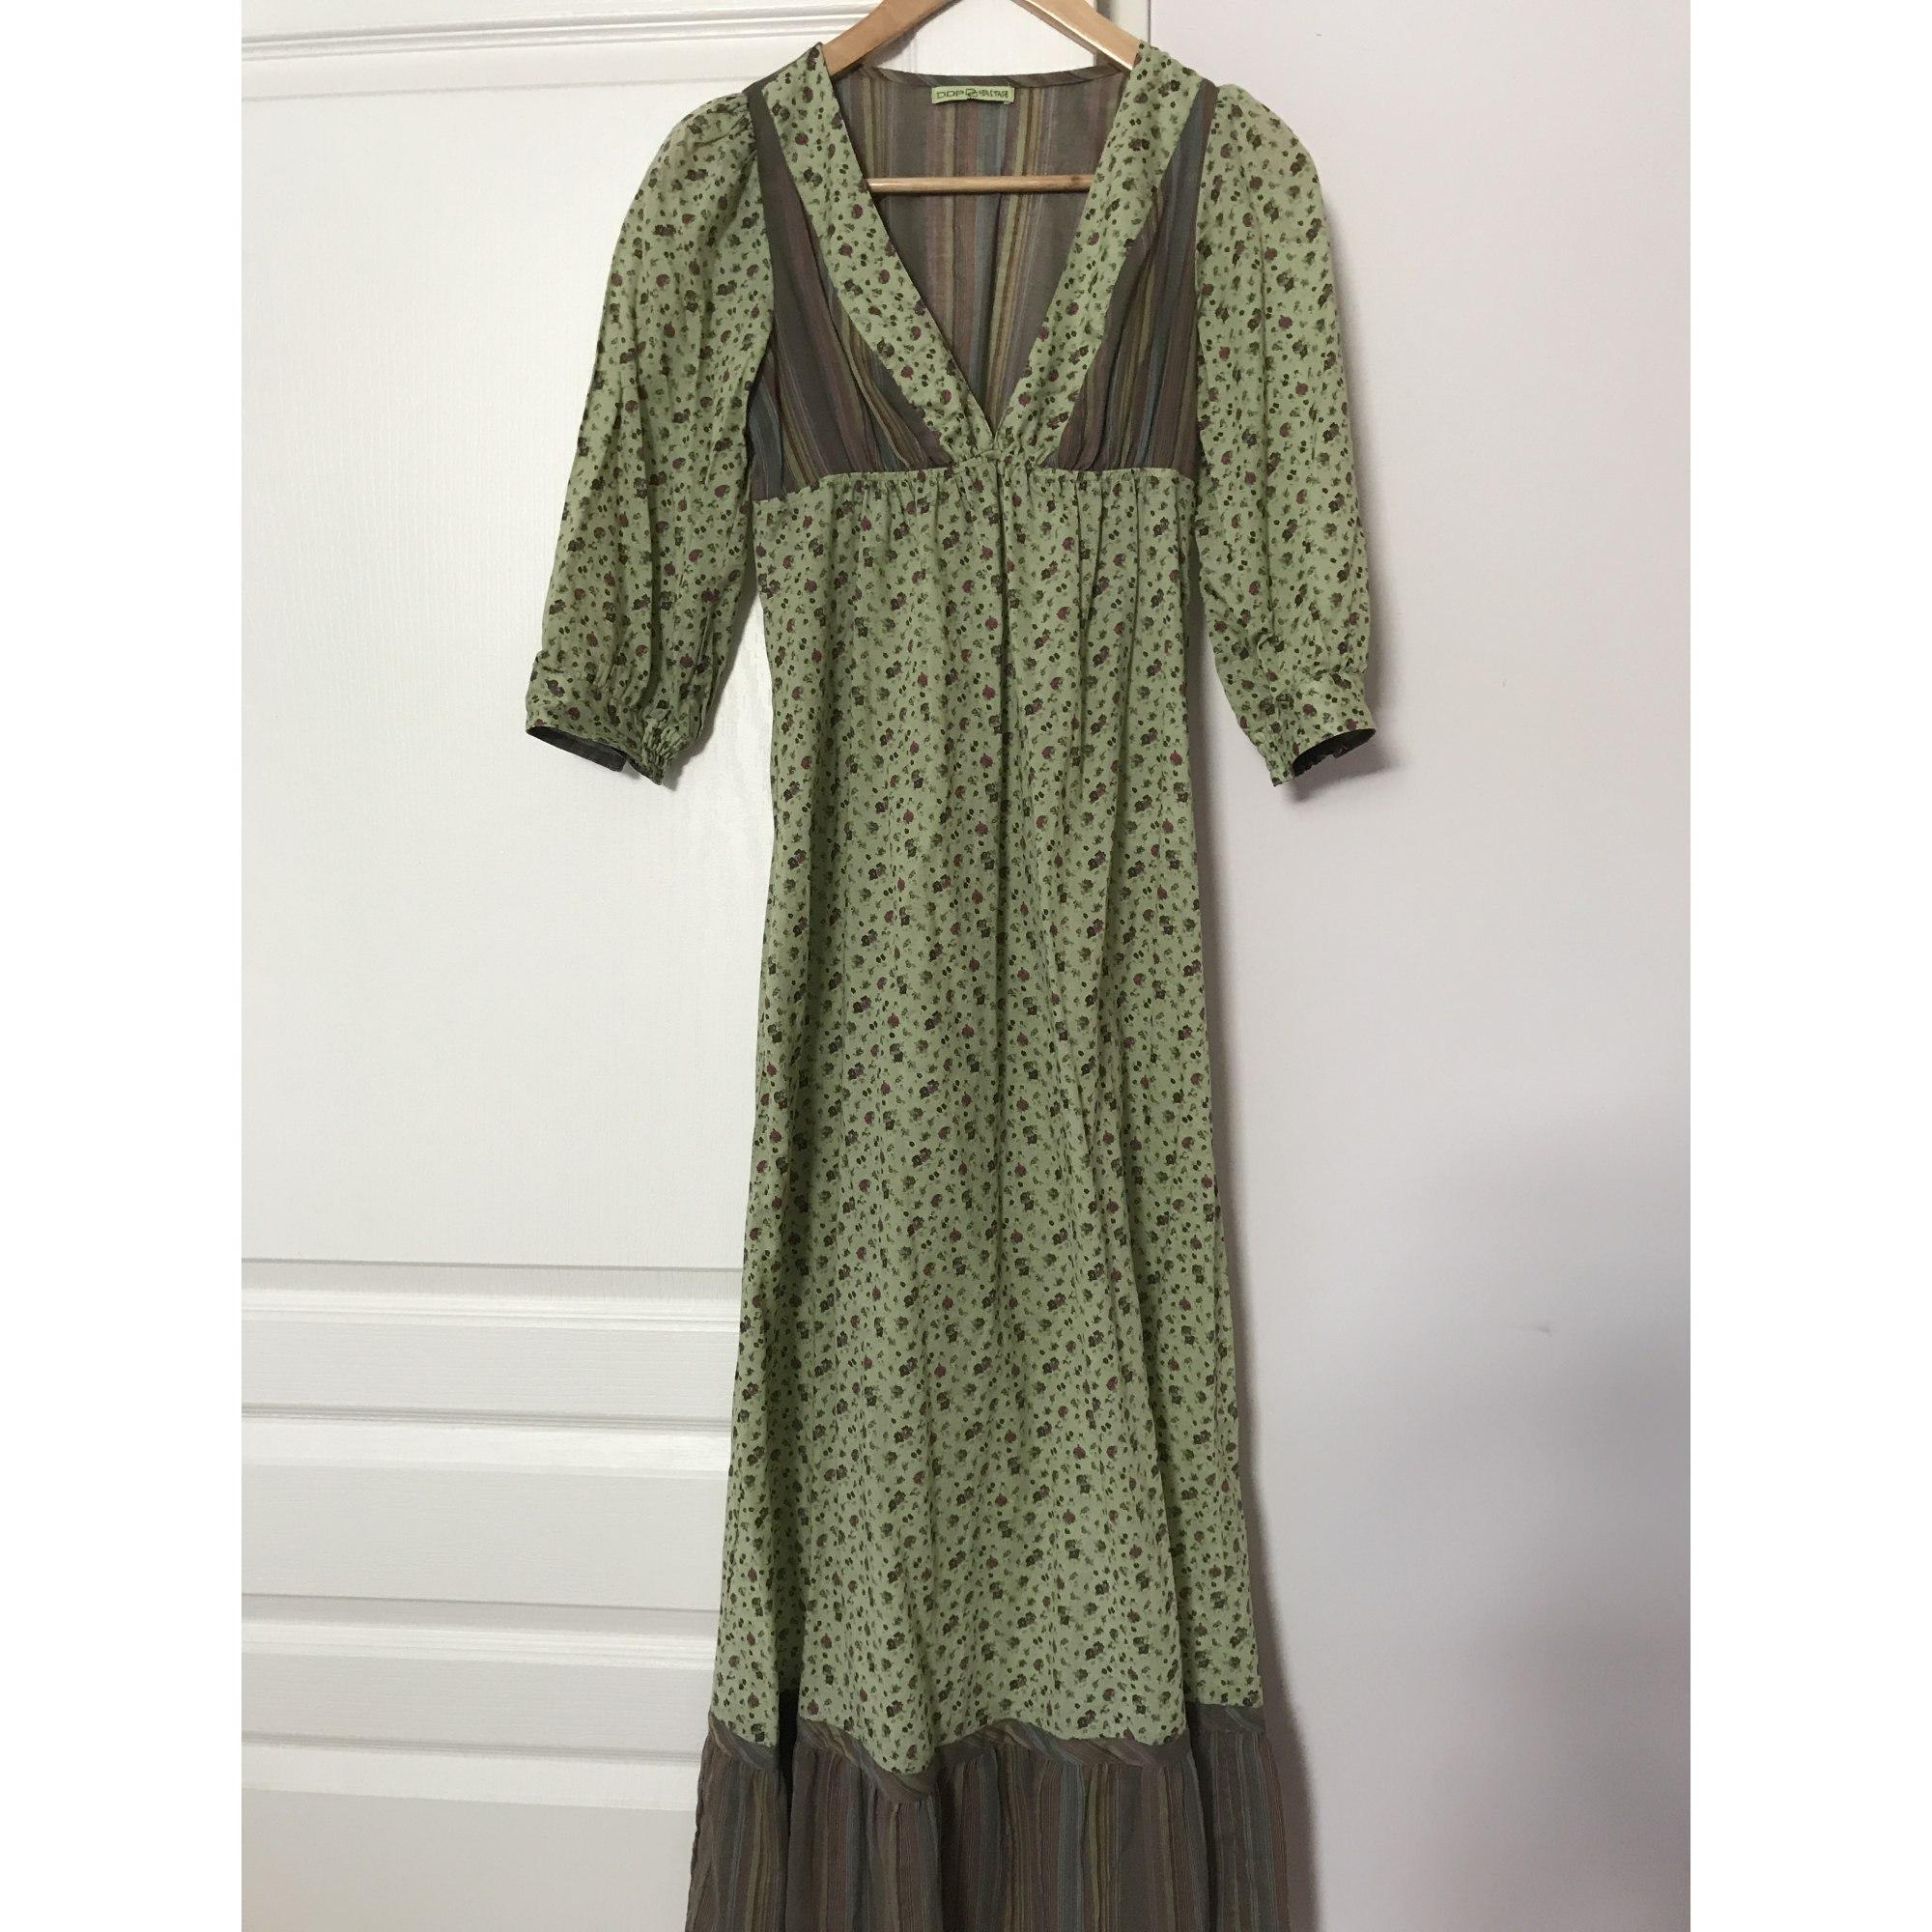 Robe Longue Ddp 36 S T1 Vert 6228990